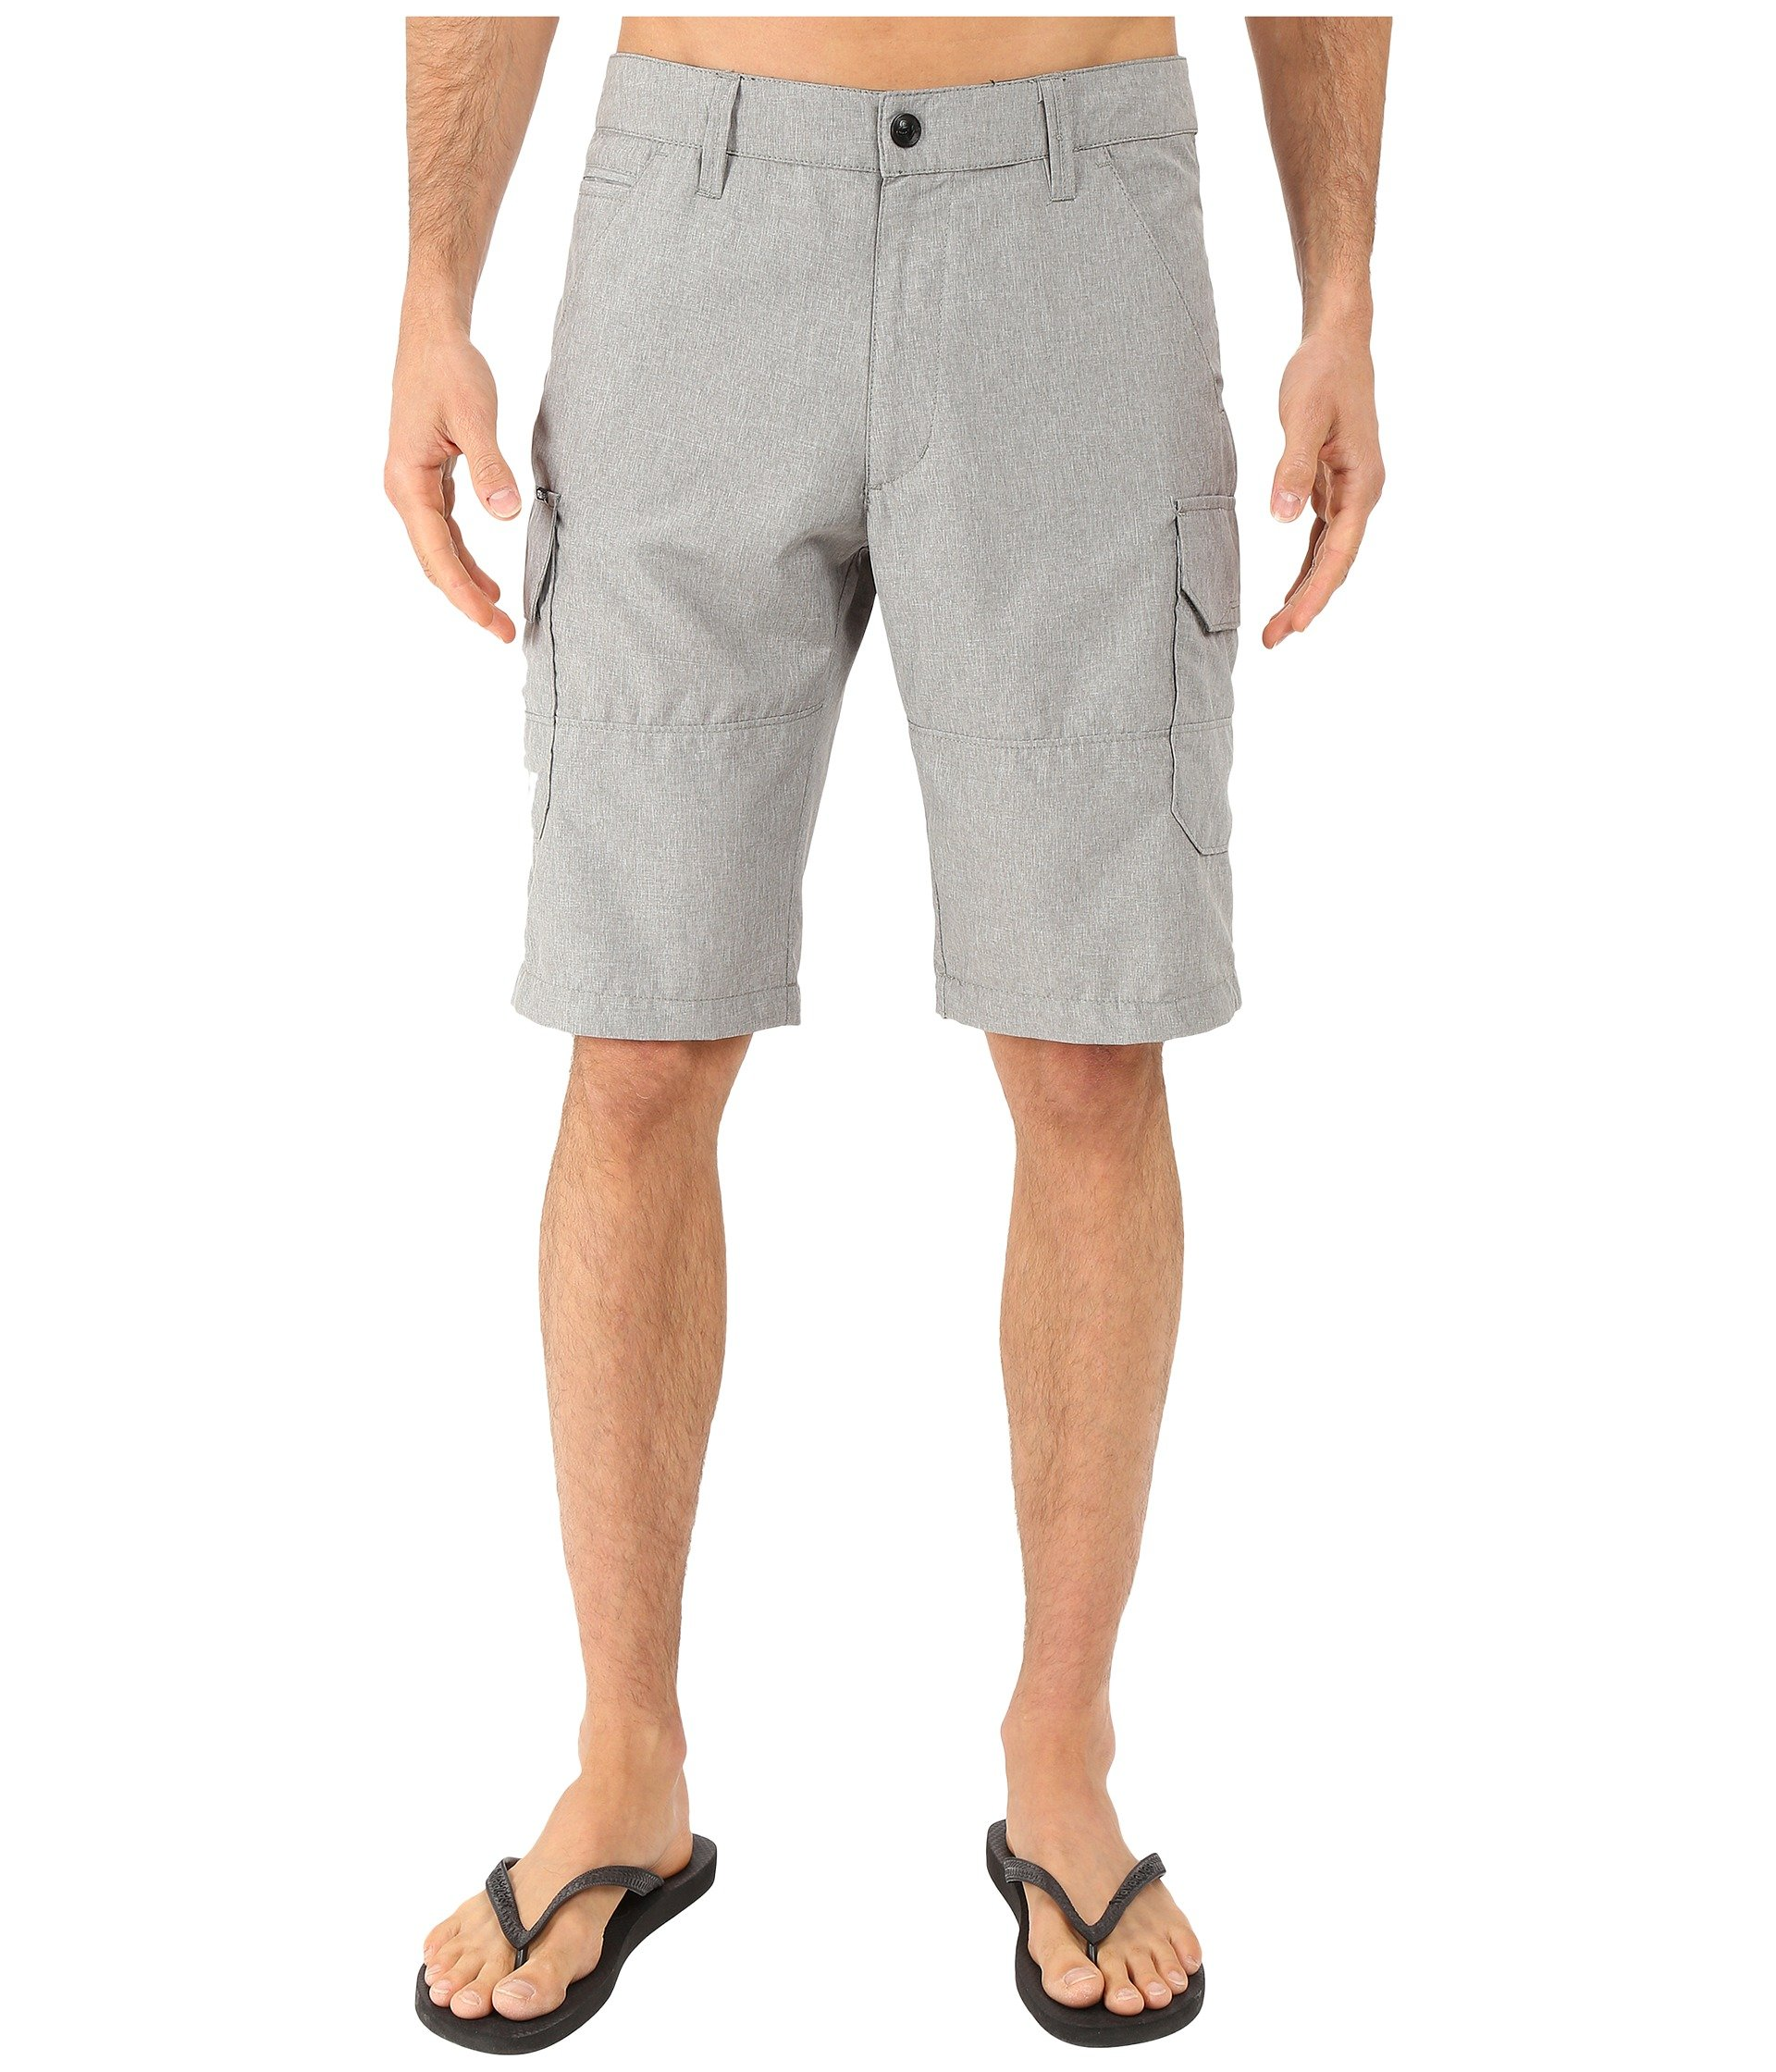 Pantaloneta para Hombre Fox Slambozo Tech Shorts  + Fox en VeoyCompro.net